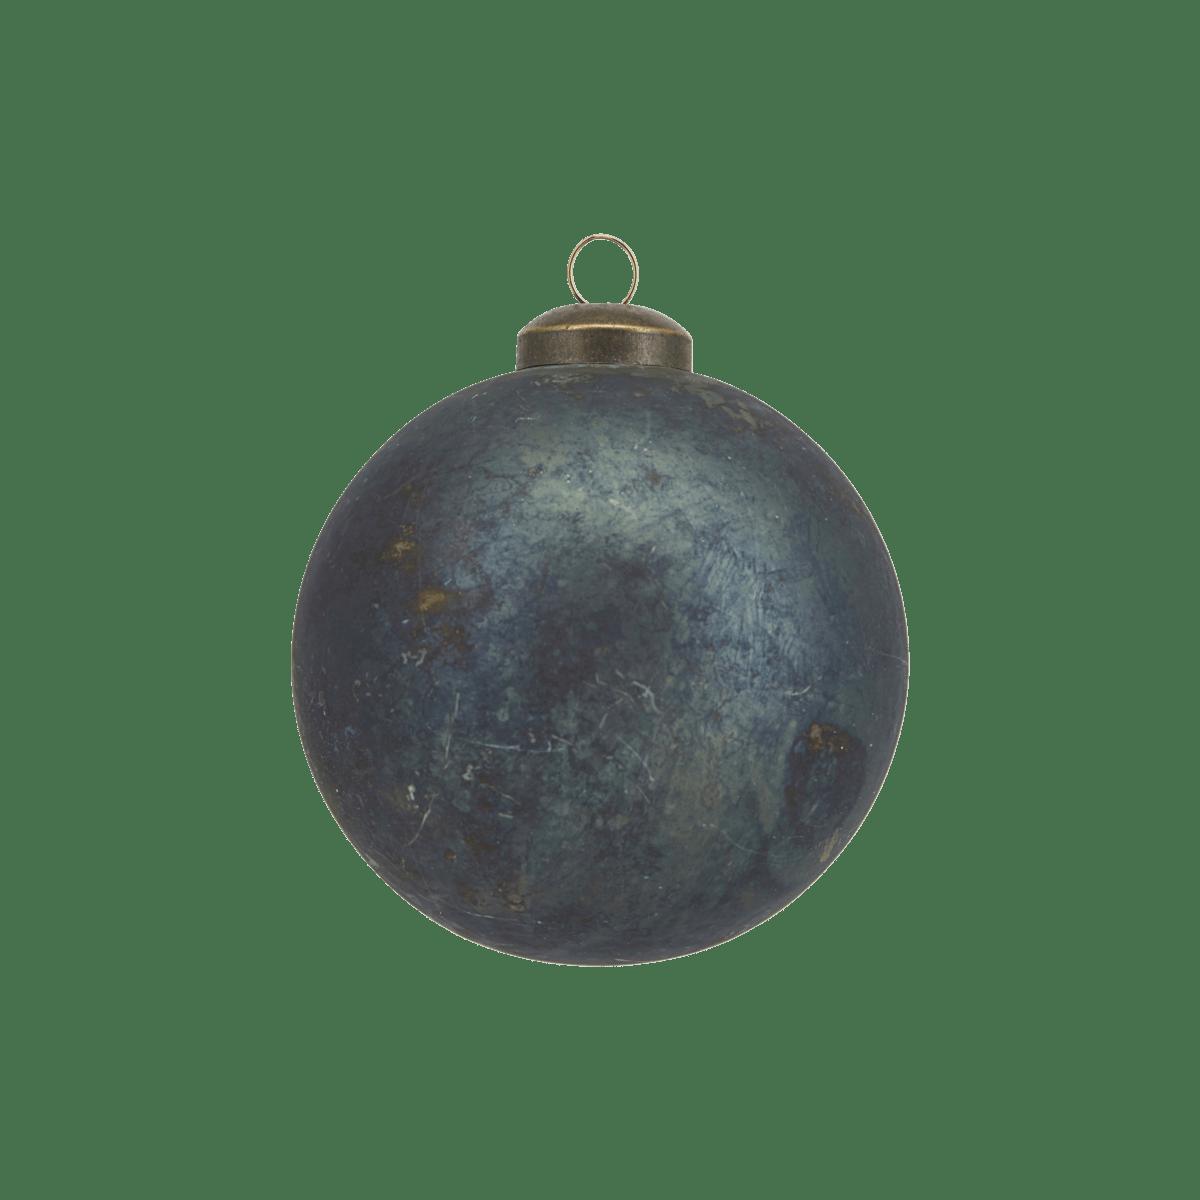 Modrá dekorační baňka Nuance